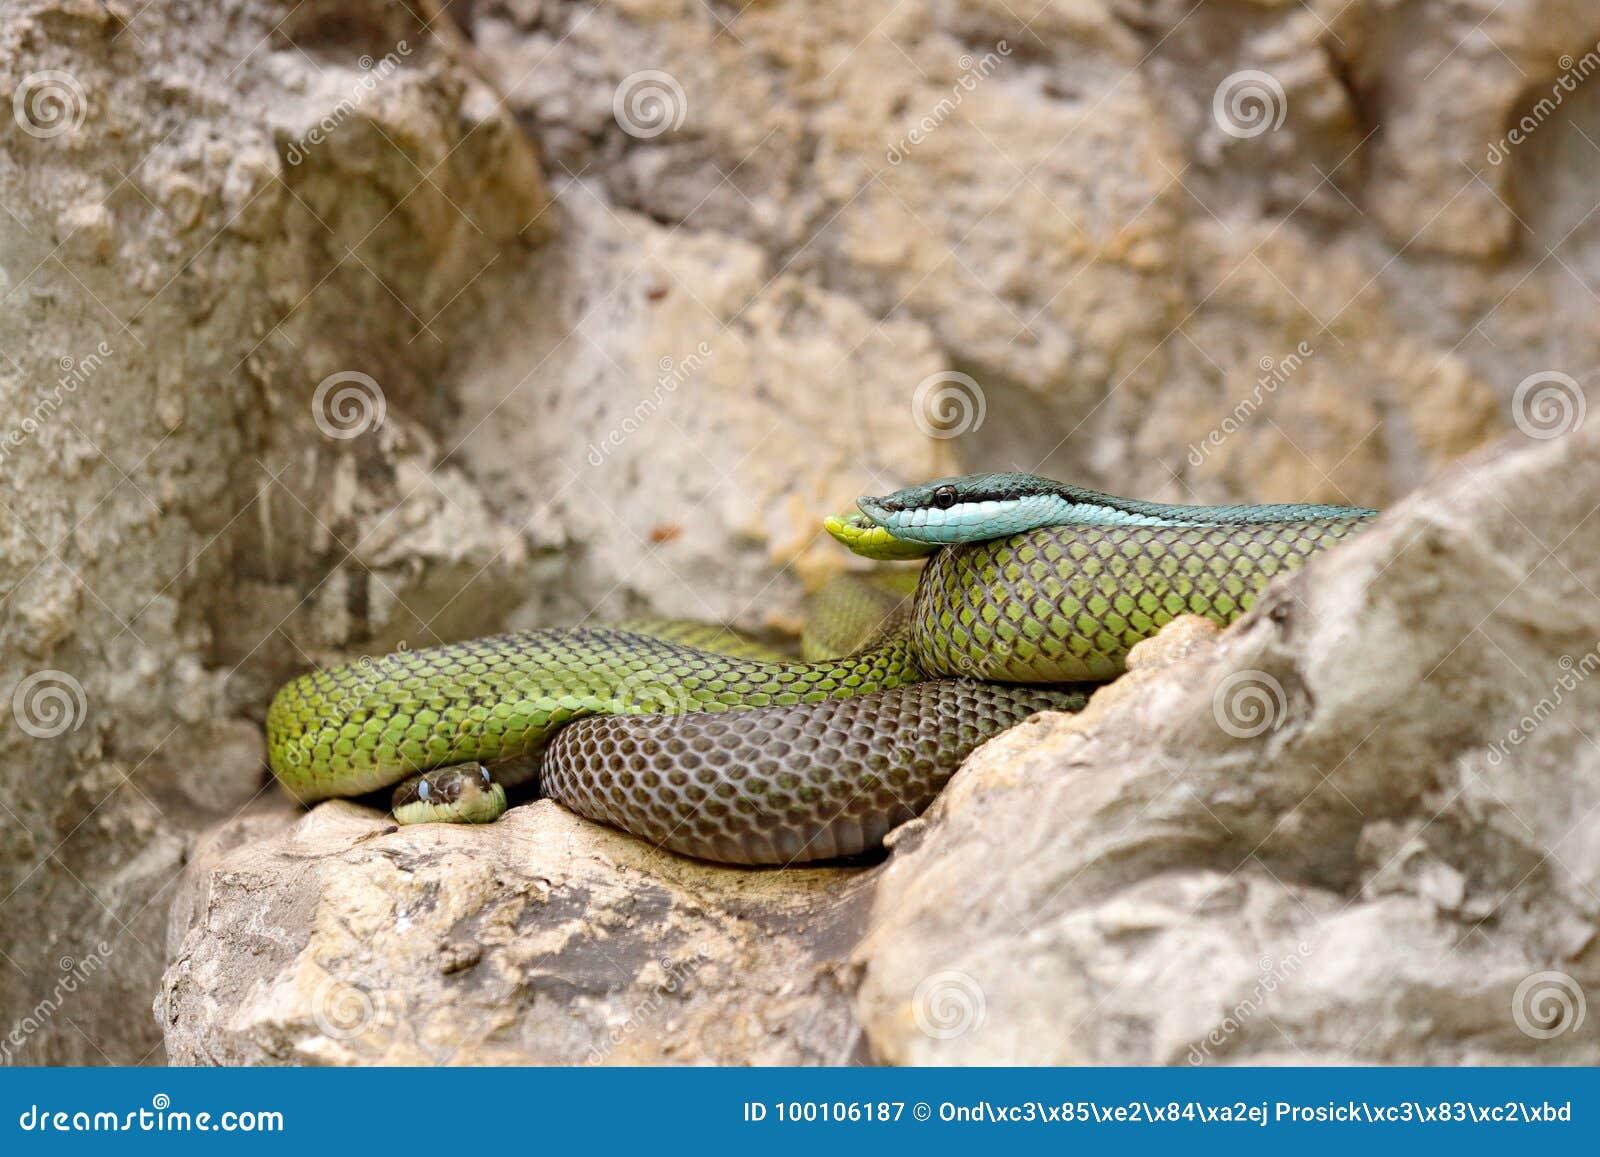 Baroni Philodryas, πράσινος δρομέας βαρώνων ` s, πέτρα κοντά στο βιότοπο ποταμών Σκηνή άγριας φύσης από τη φύση Φίδι από τη Βολιβ